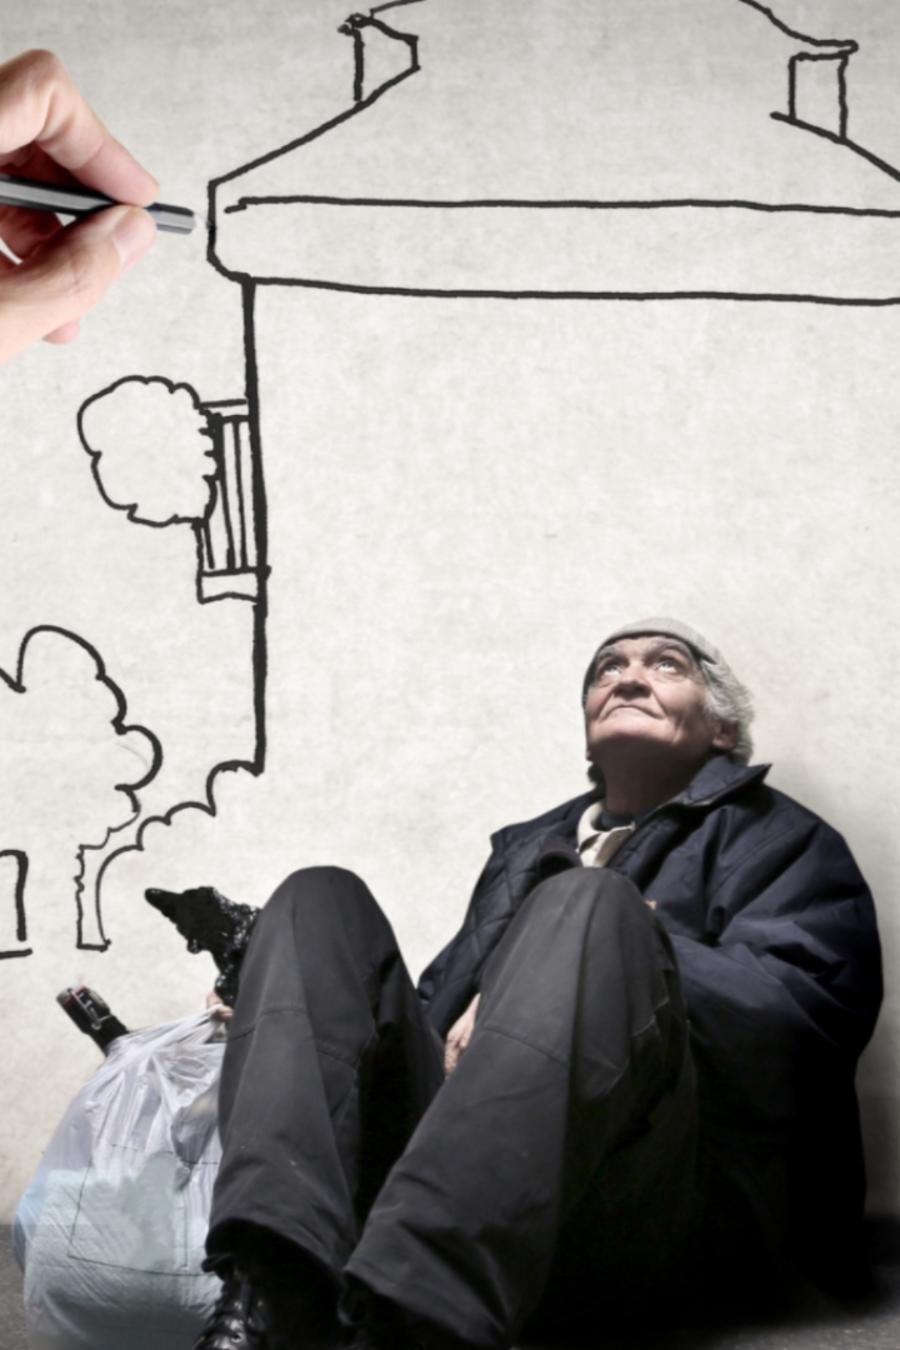 Persona homeless